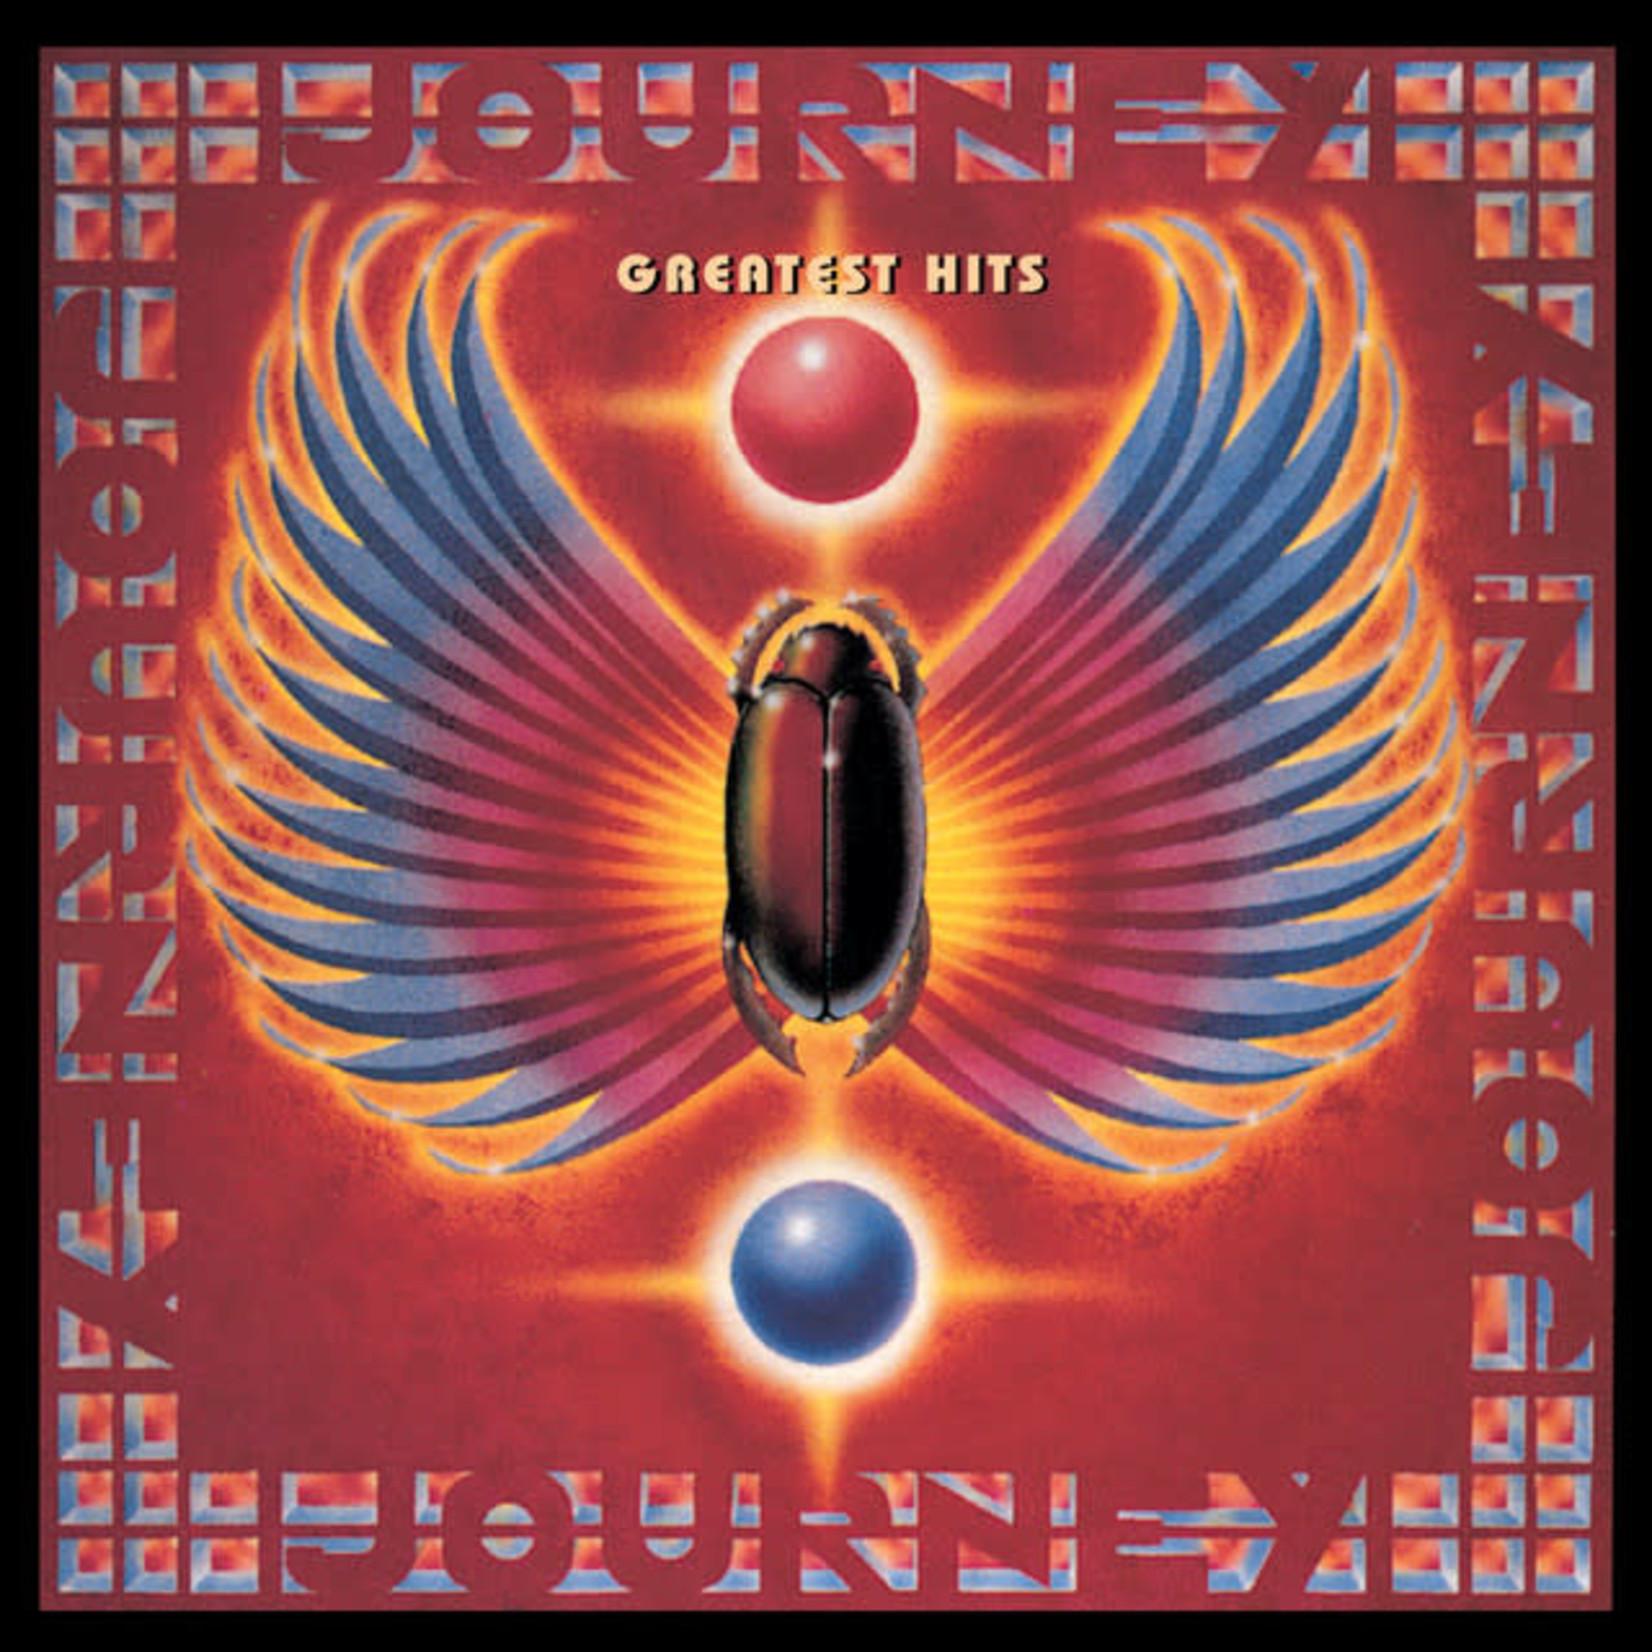 Vinyl Journey - Greatest Hits